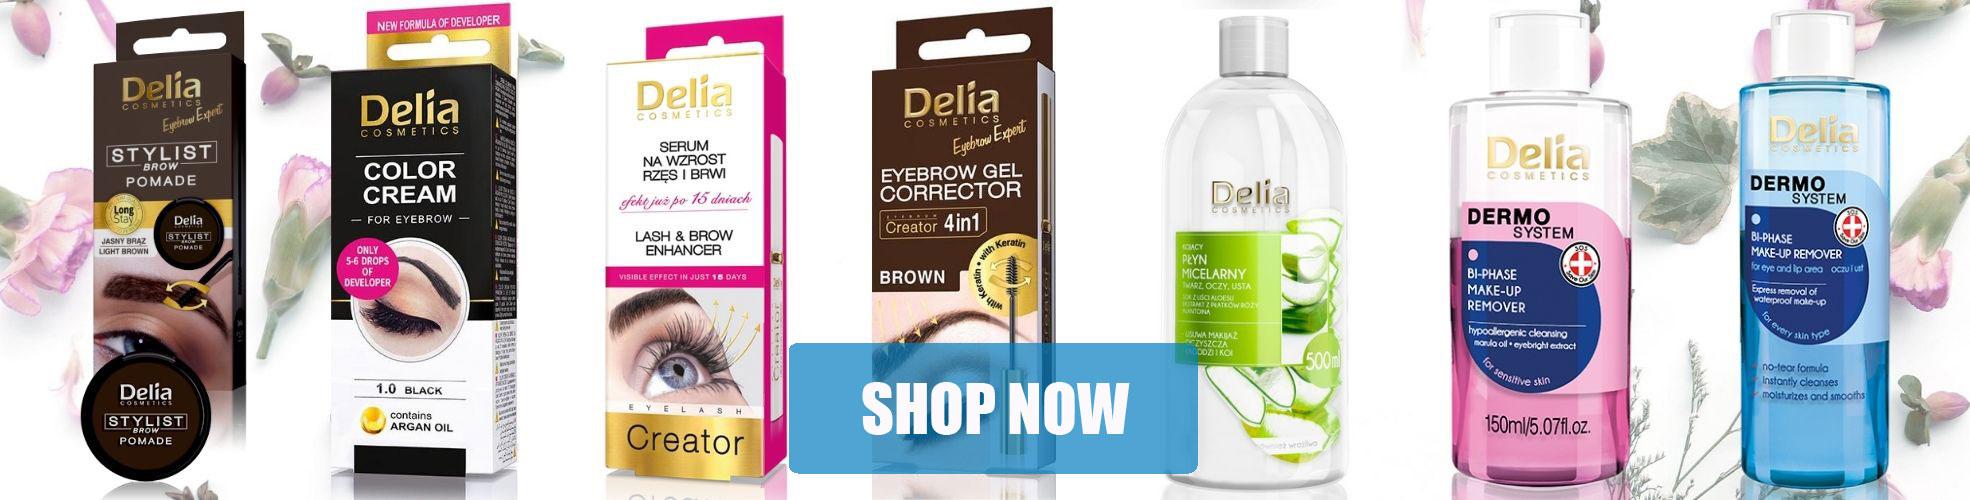 Wholesale Delia Cosmetics Eyebrow & Eyelash Care Face Care